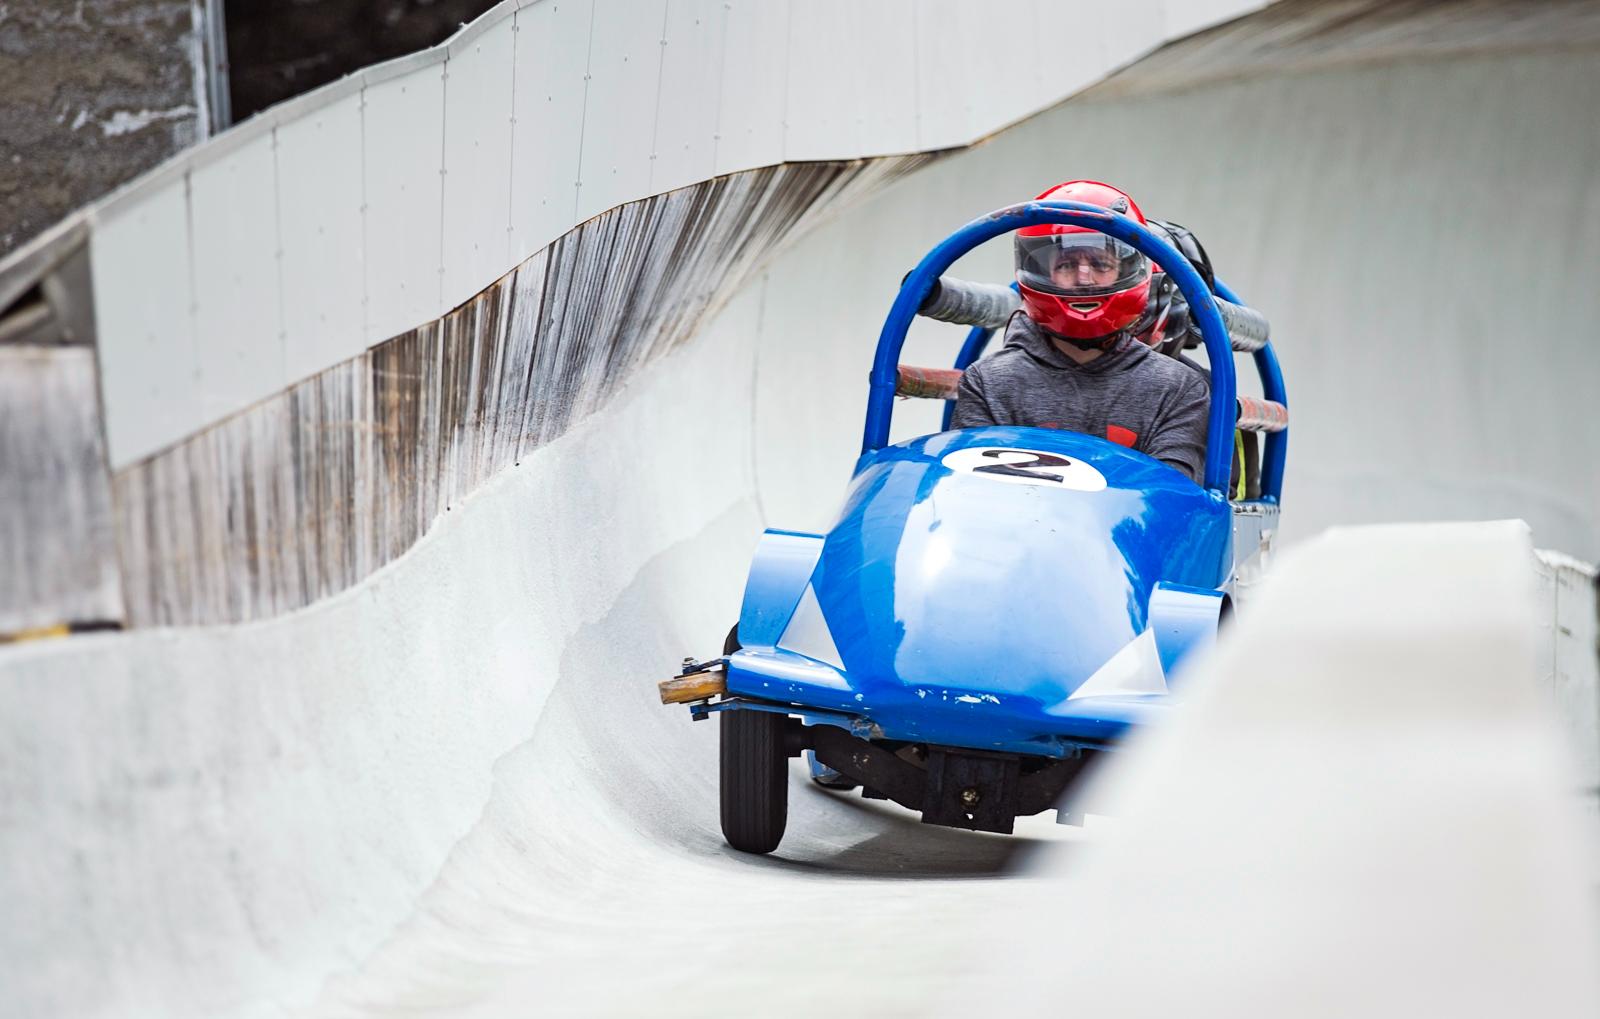 bobfahren-igls-bg3